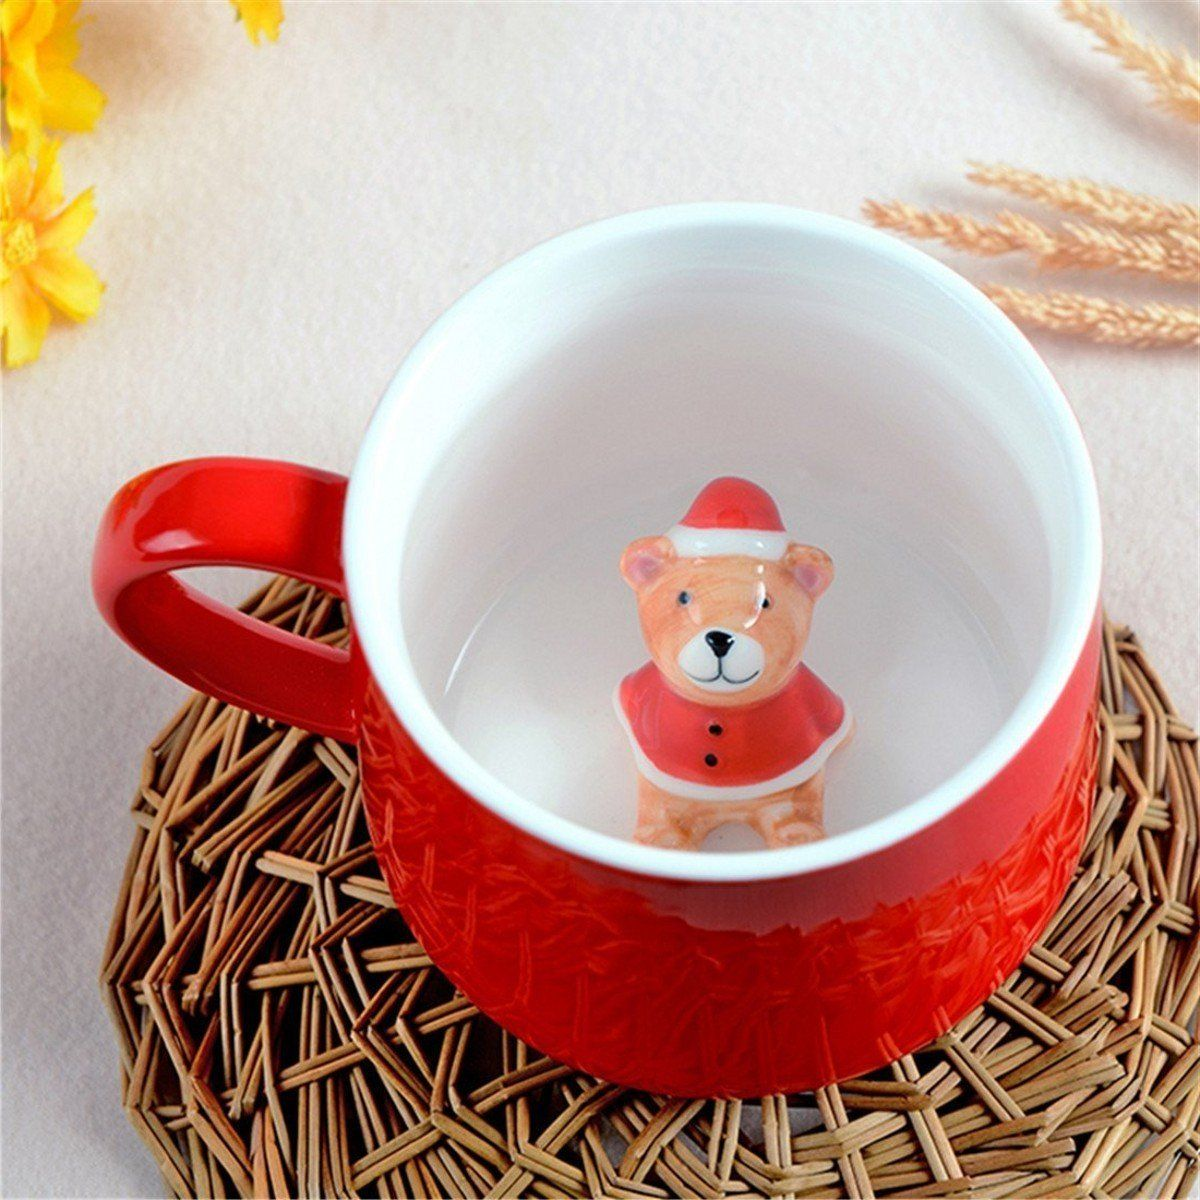 SHINA 3D Cartoon Tier Kaffeetasse Tee Tasse Keramik Milch Mug Tasse ...